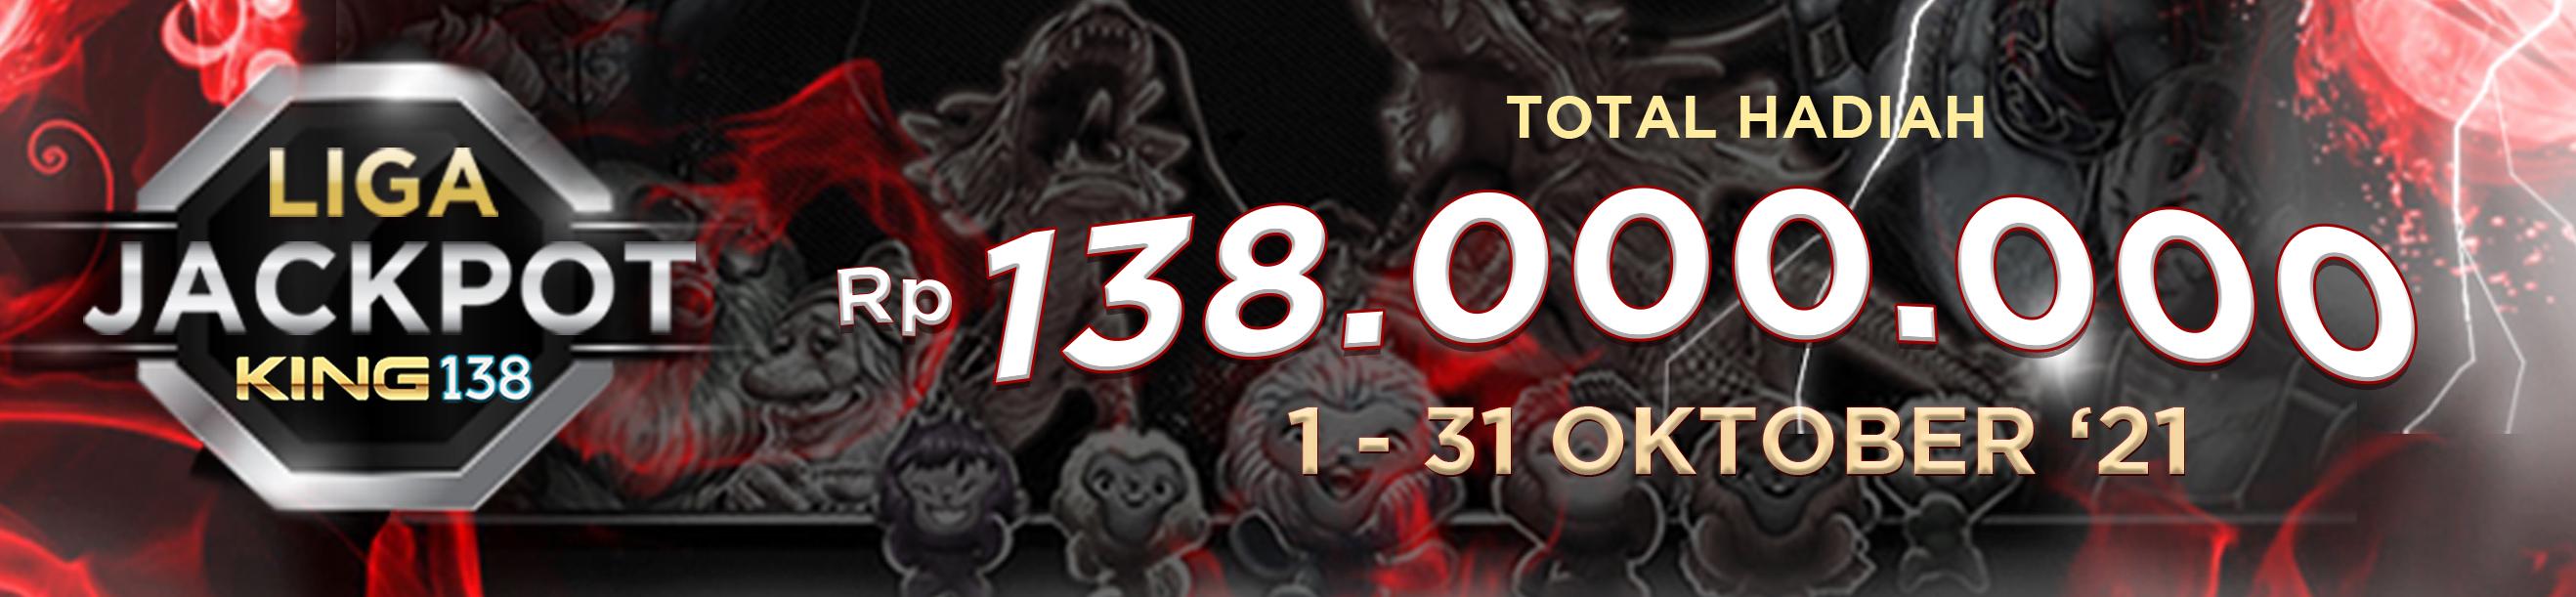 Liga Jackpot King138